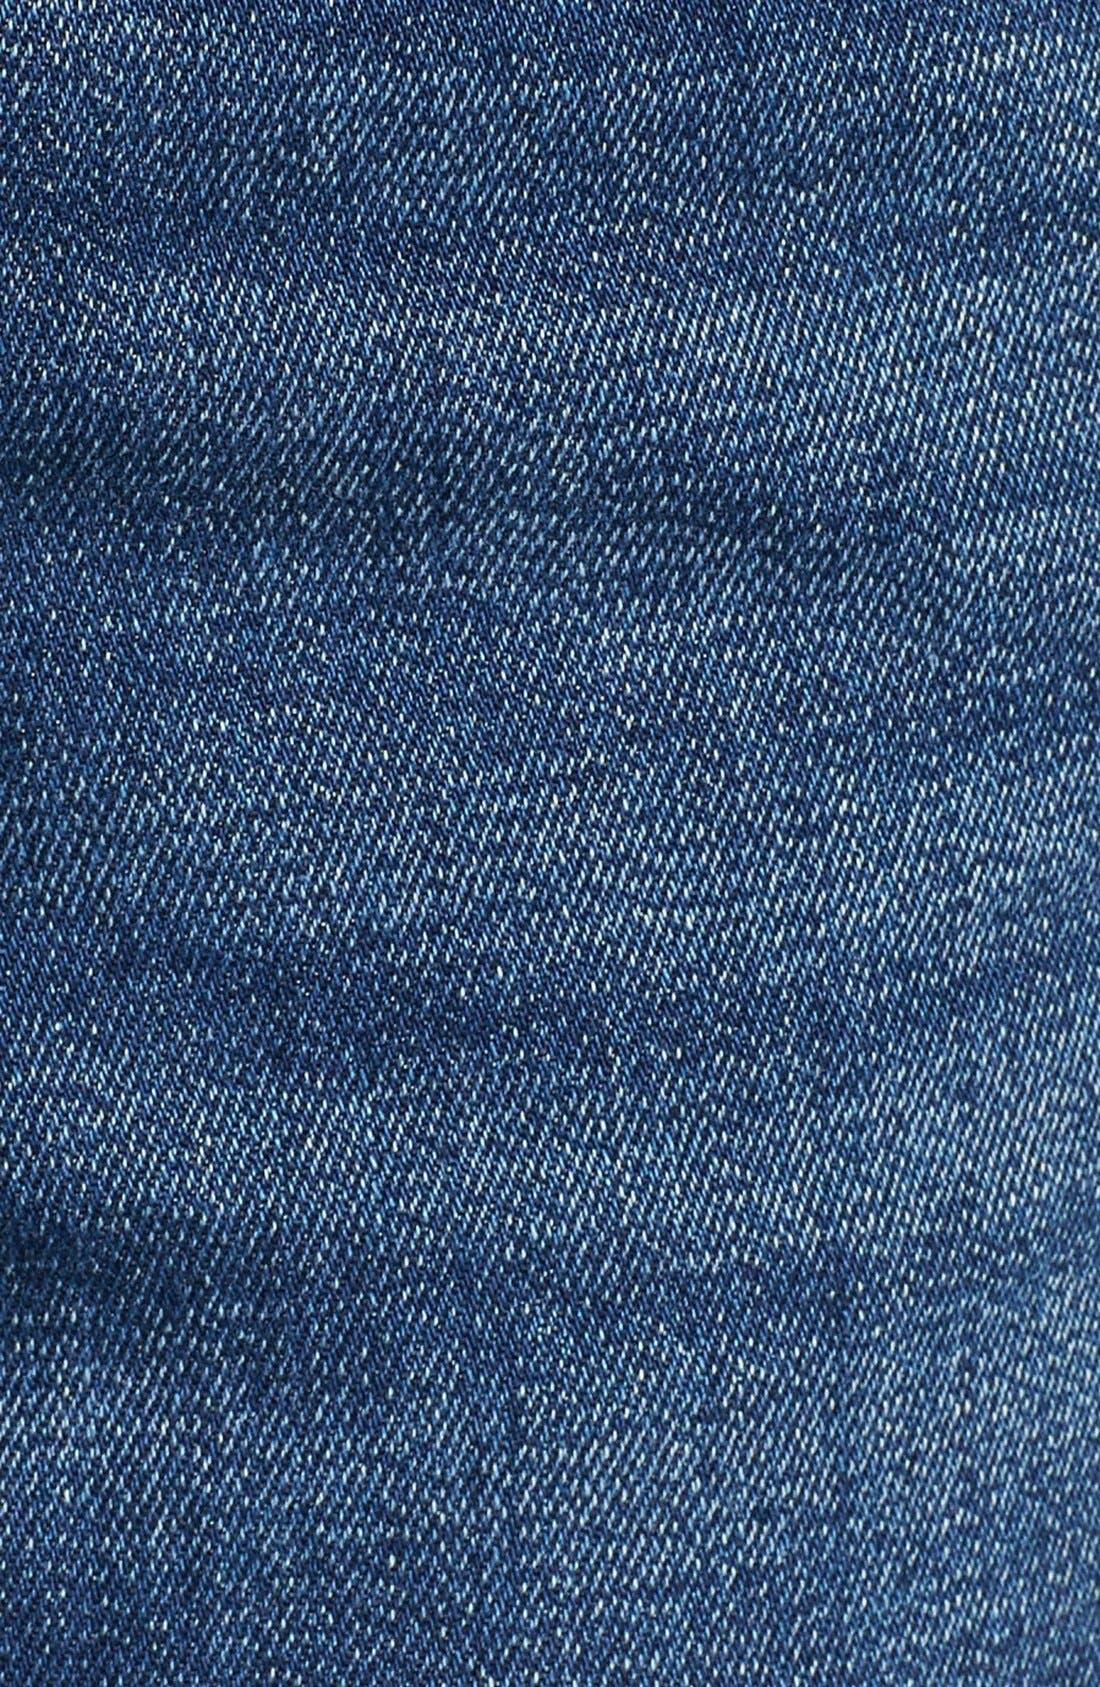 Alternate Image 5  - RVCA 'Highly Vibed' Cutoff Denim Shorts